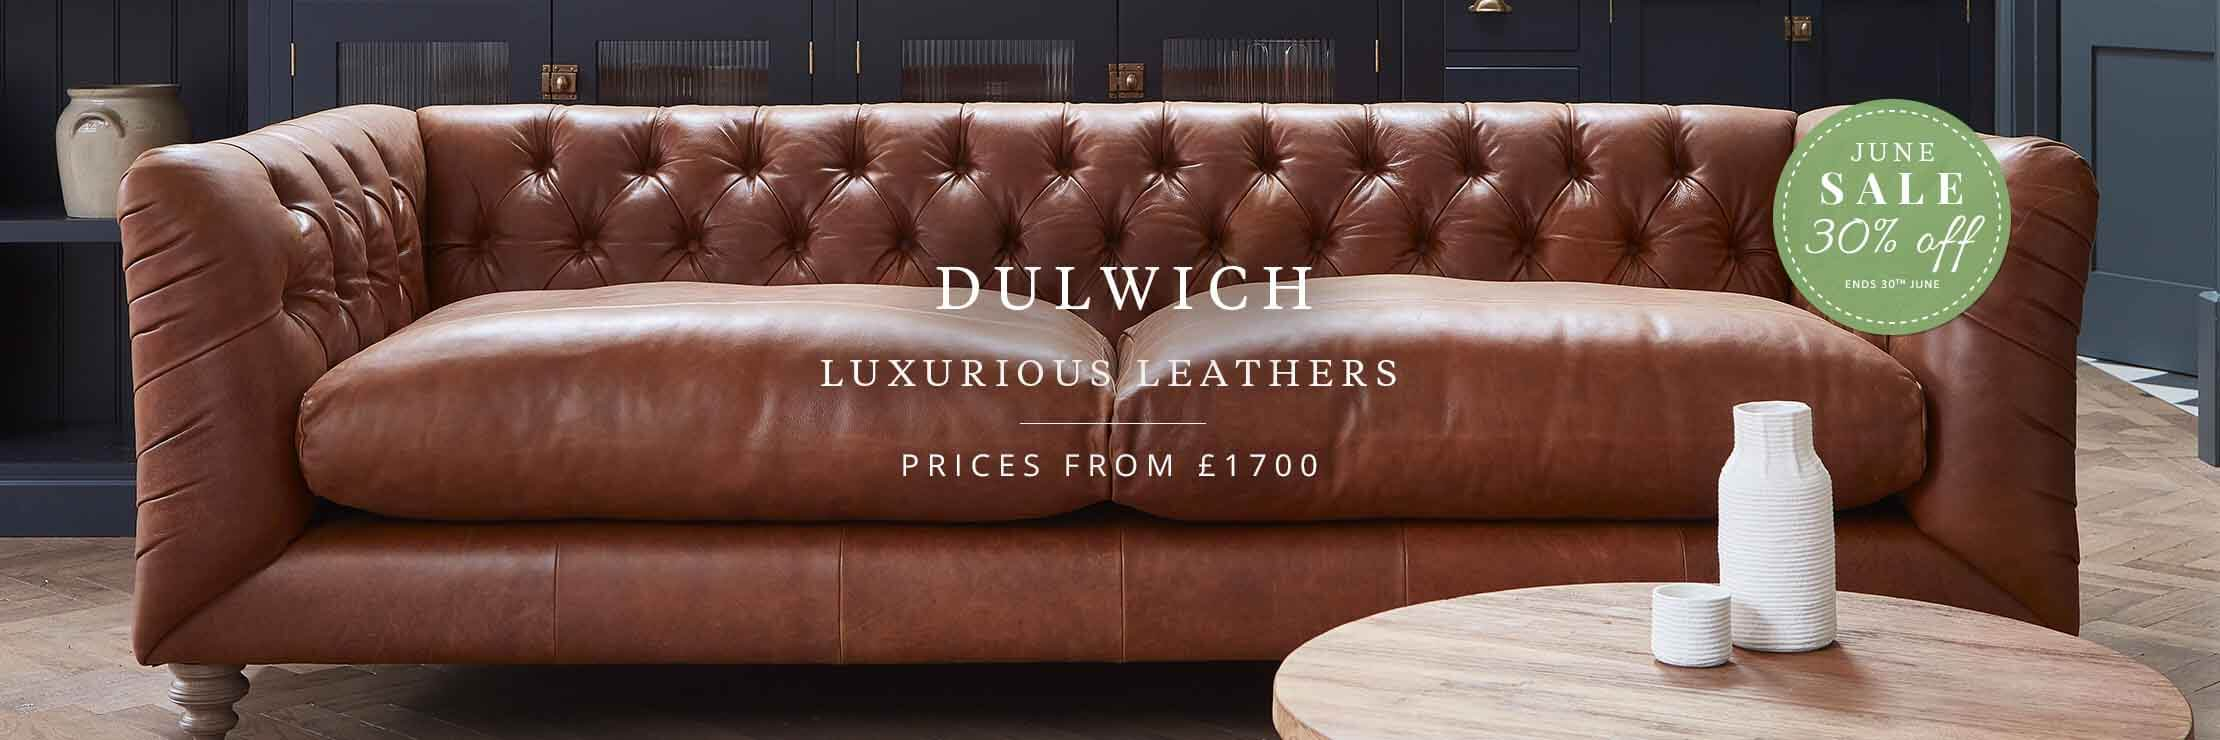 Dulwich Sofa